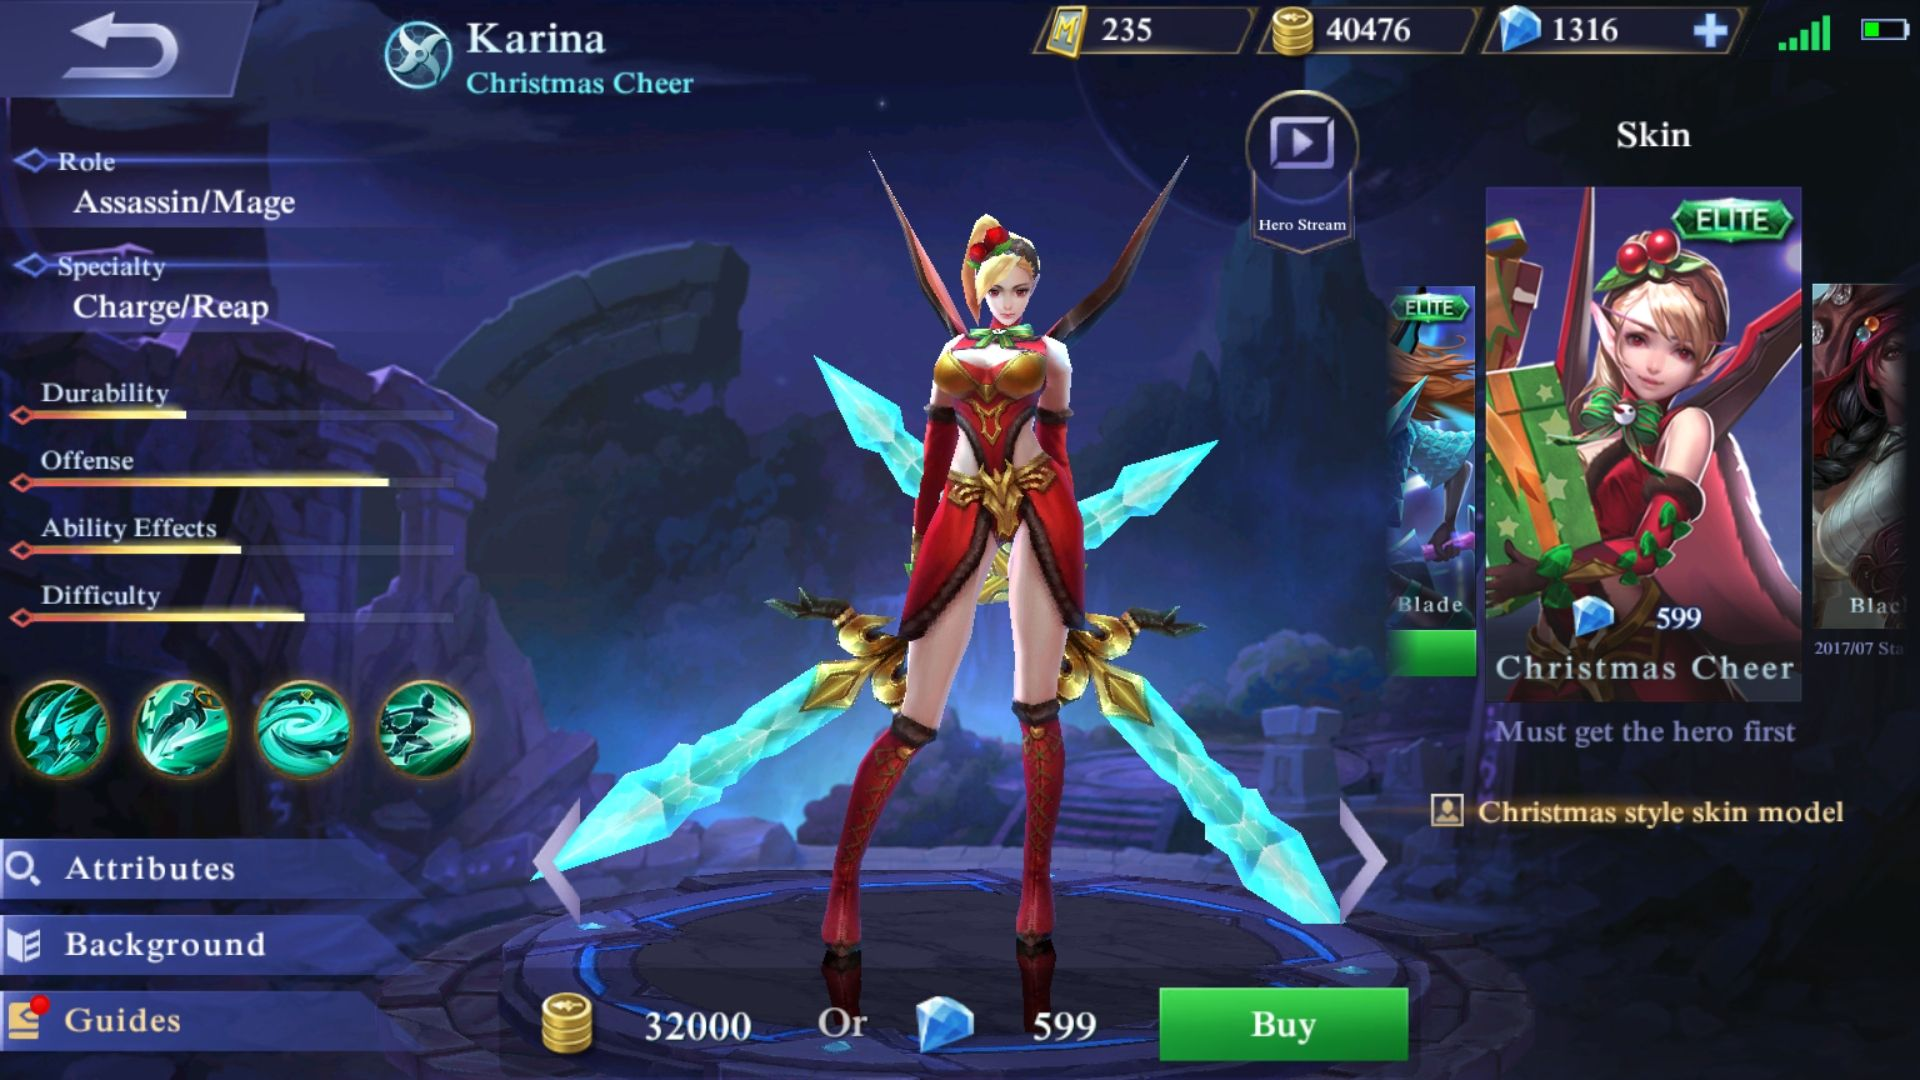 hero-cewek-mobile-legends-karina